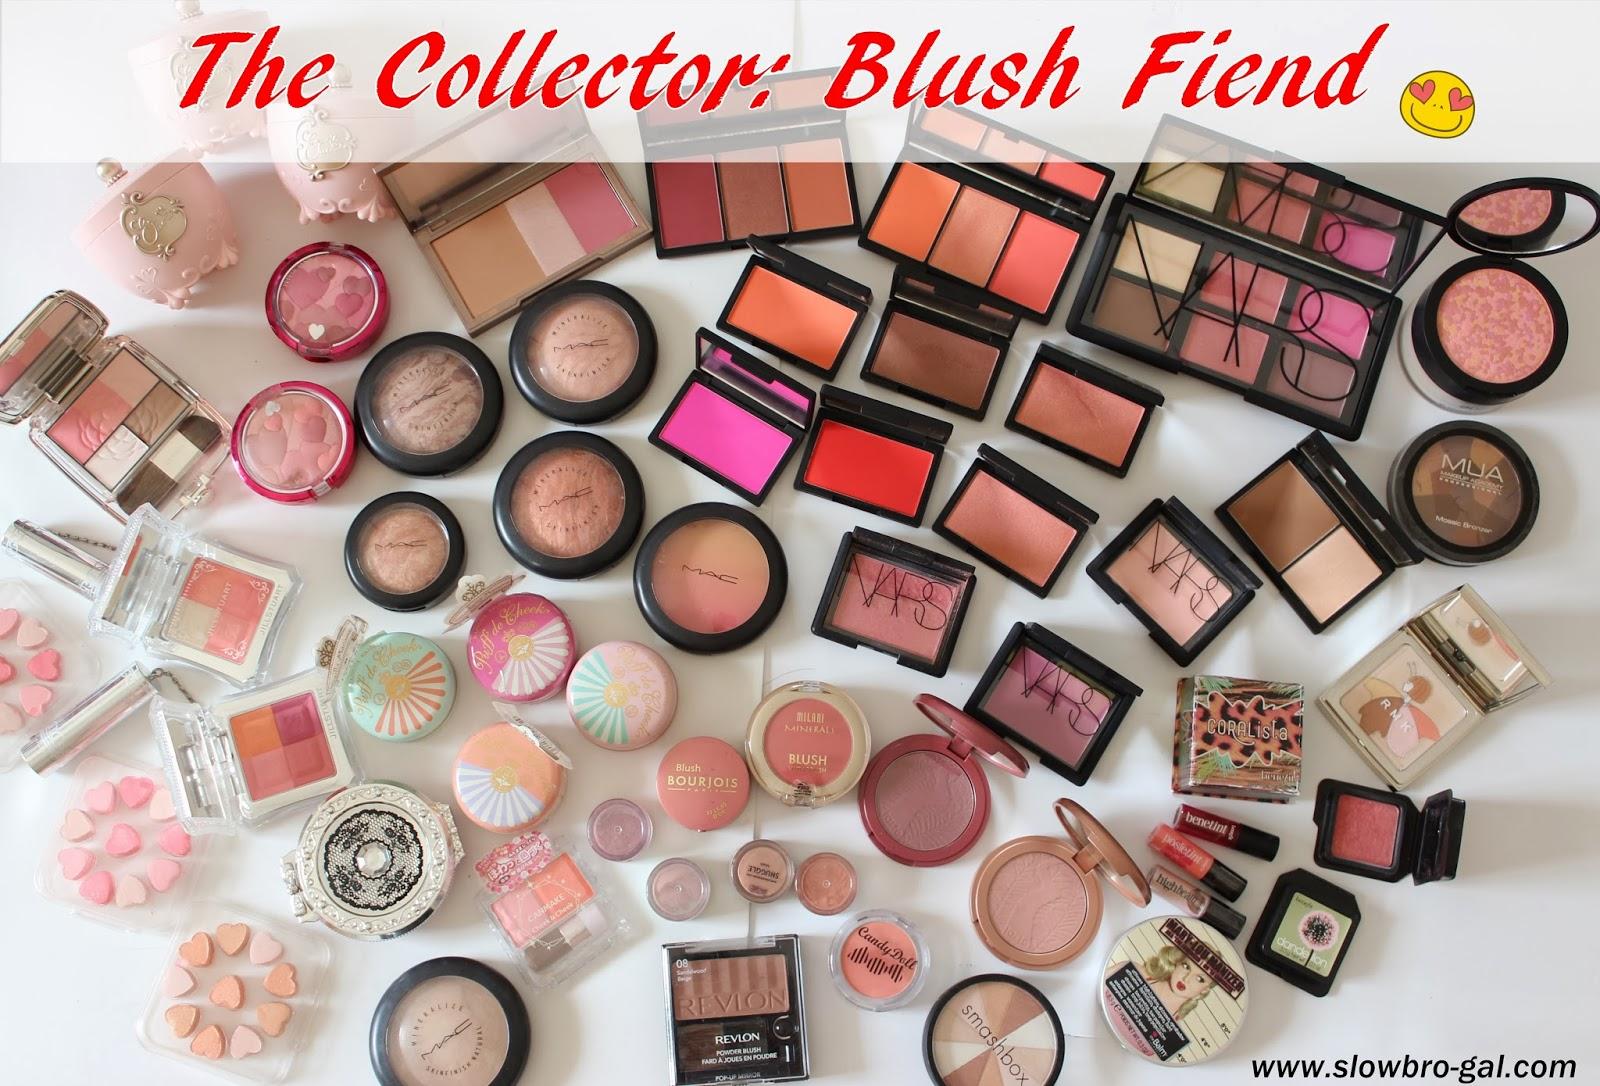 The Collector: I'm a Blush Fiend